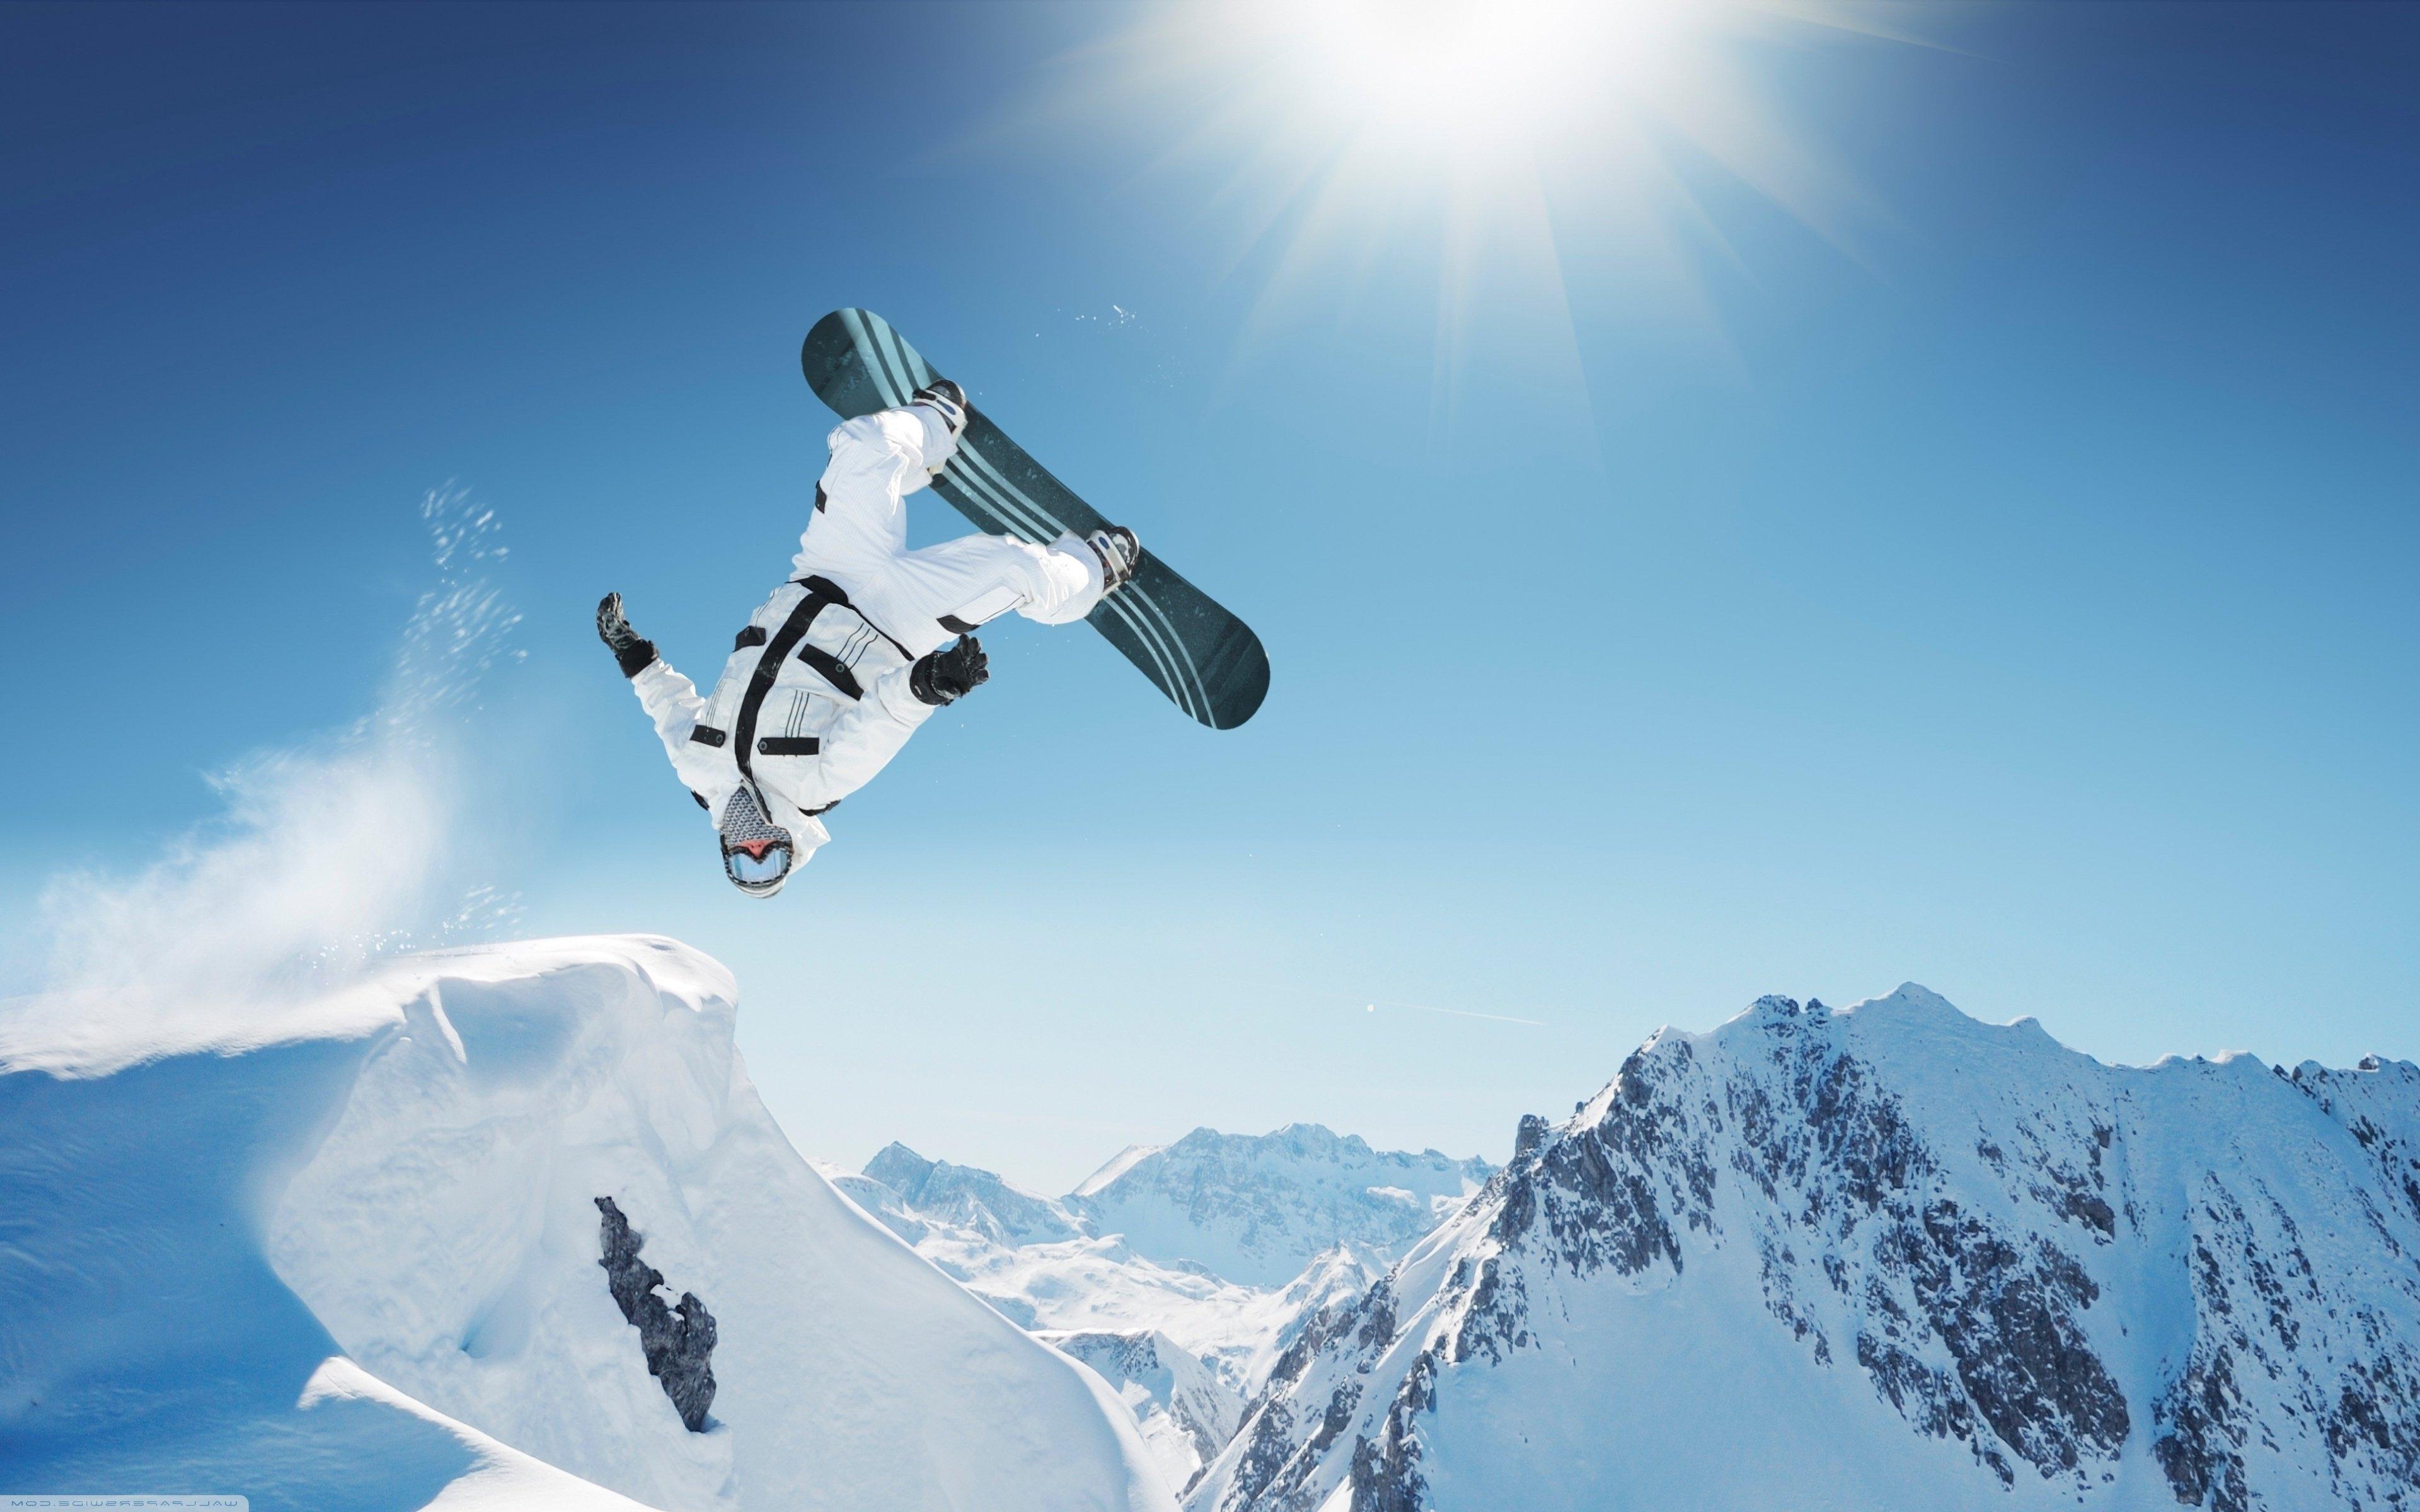 Wallpaper 3840x2400 Px Extreme Jump Mountain